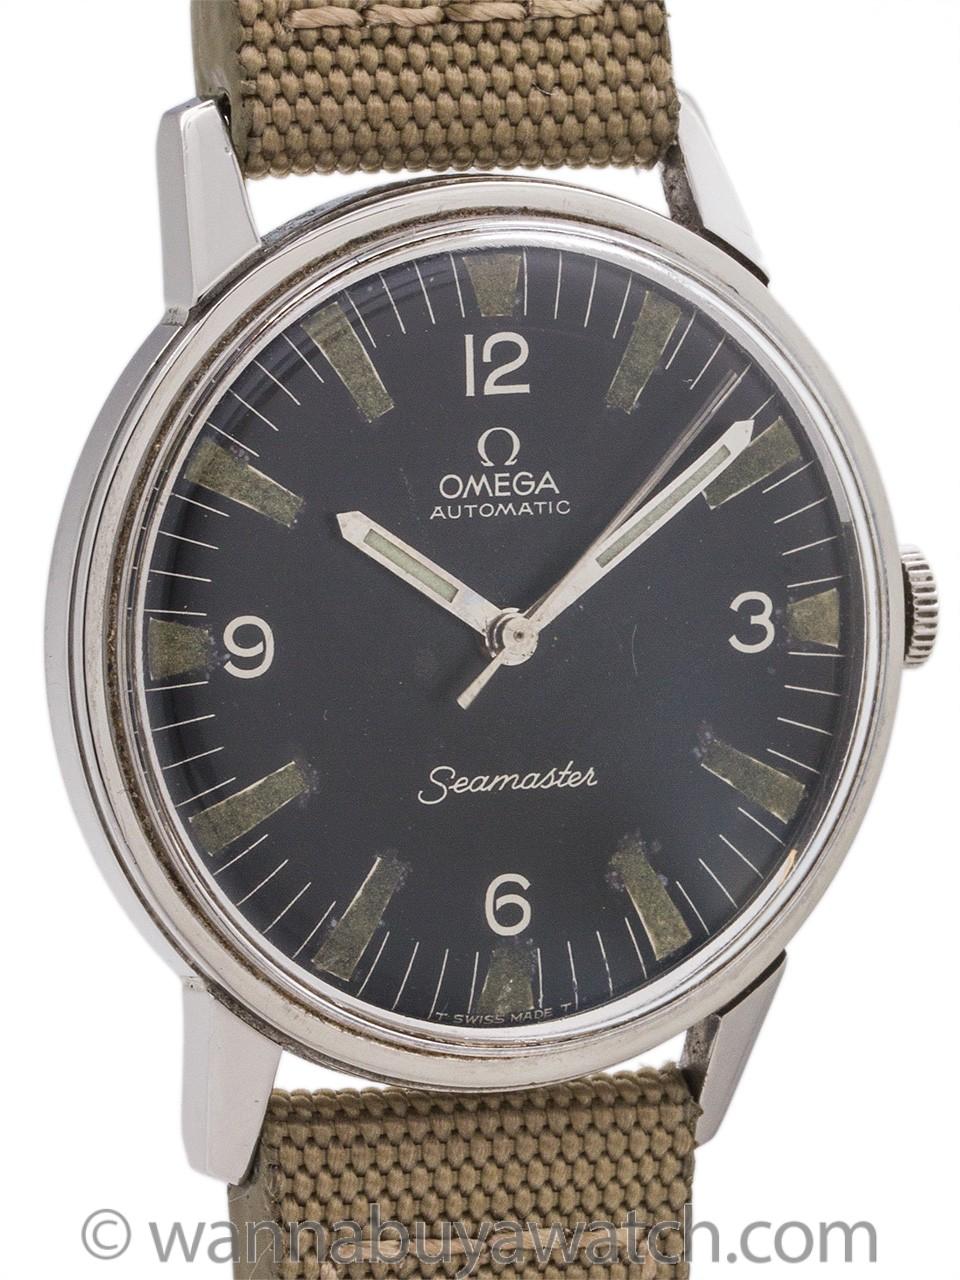 Omega Seamaster ref 163.002 circa 1966